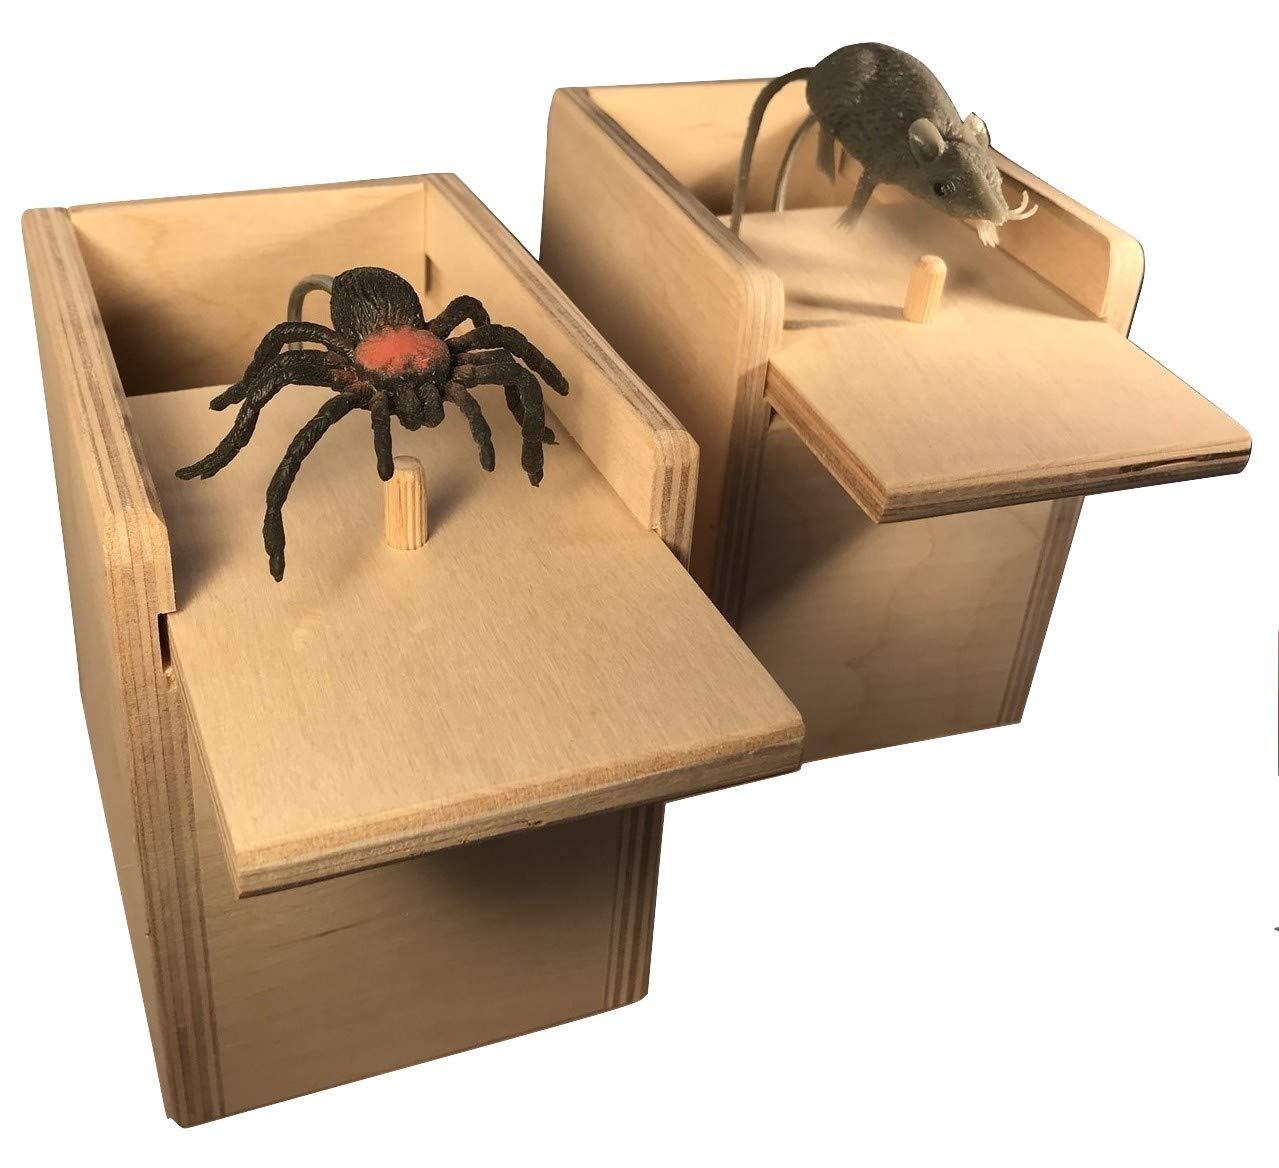 Saving Shepherd Mouse & Spider Surprise Box ~ 2 USA Handmade Fun Prank Gag Gifts by Saving Shepherd